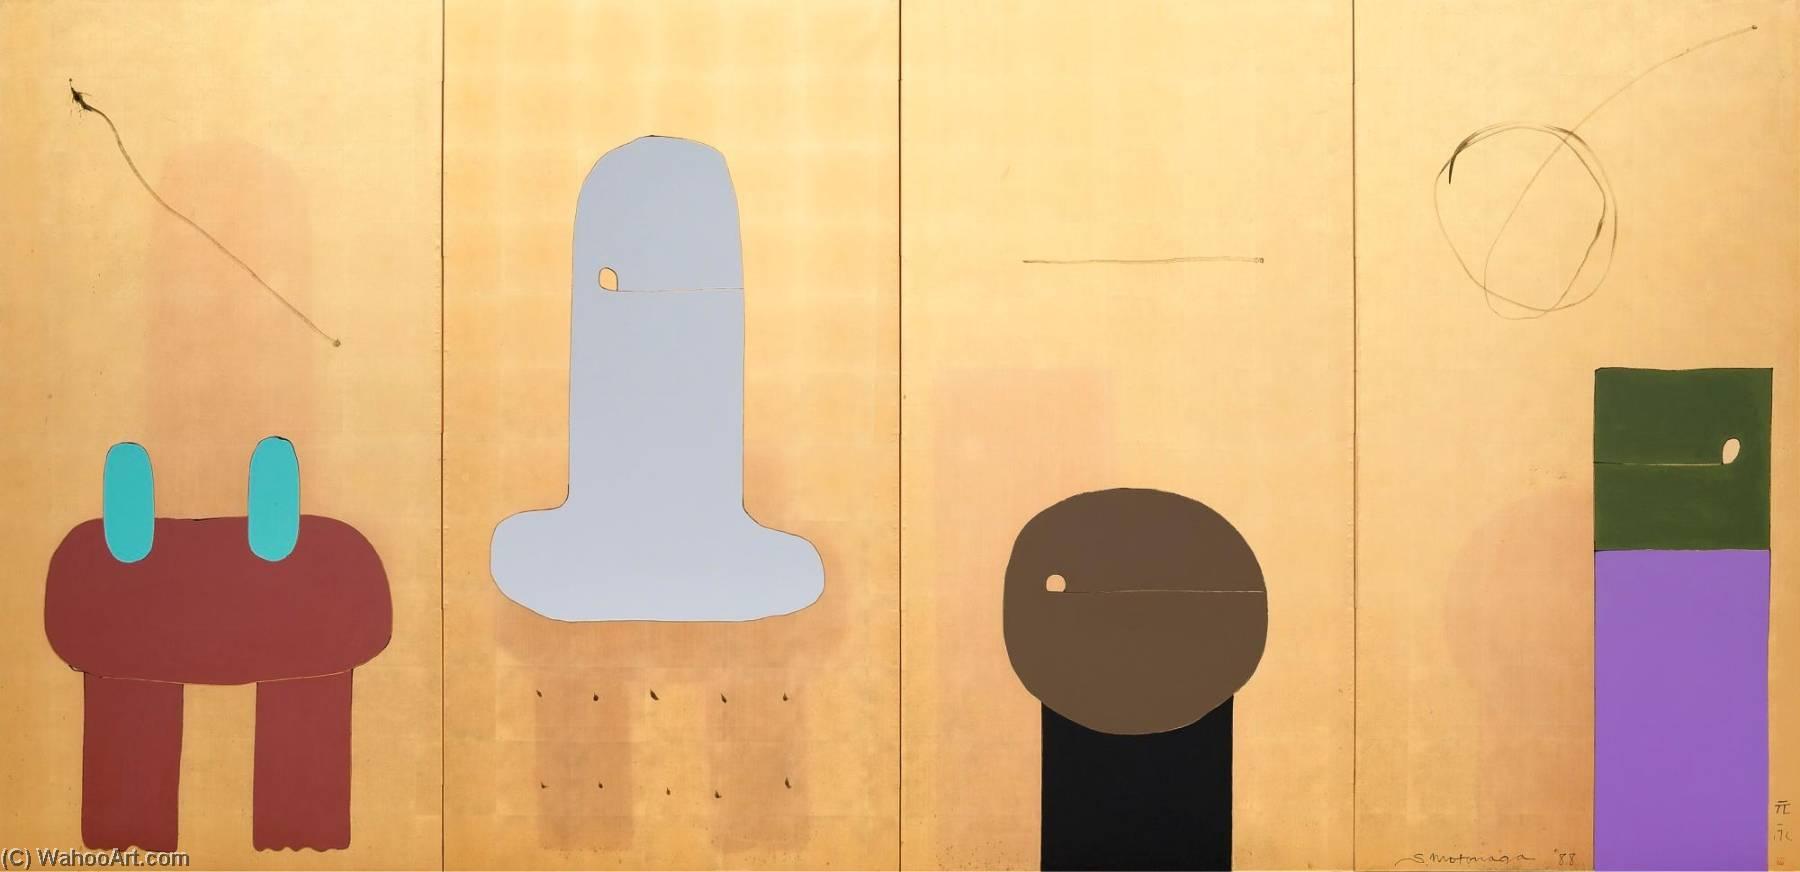 Wikioo.org - The Encyclopedia of Fine Arts - Painting, Artwork by Sadamasa Motonaga - Untitled (quadriptych folding screen)